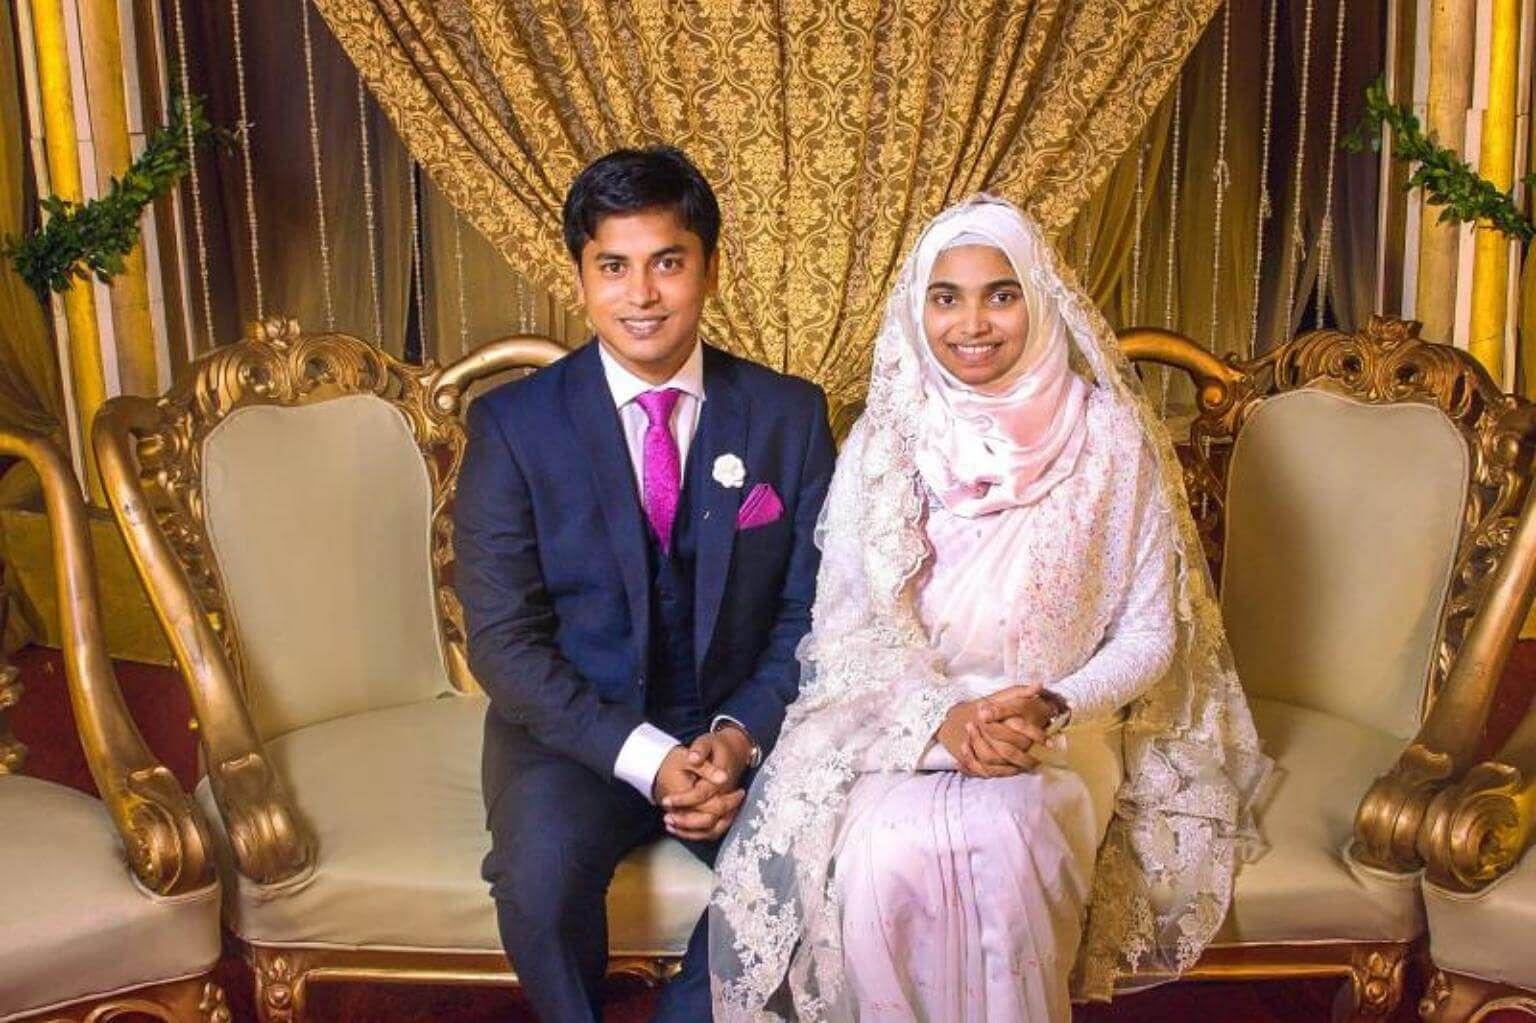 Bangladesh bride stirs social media storm after posting wedding ...